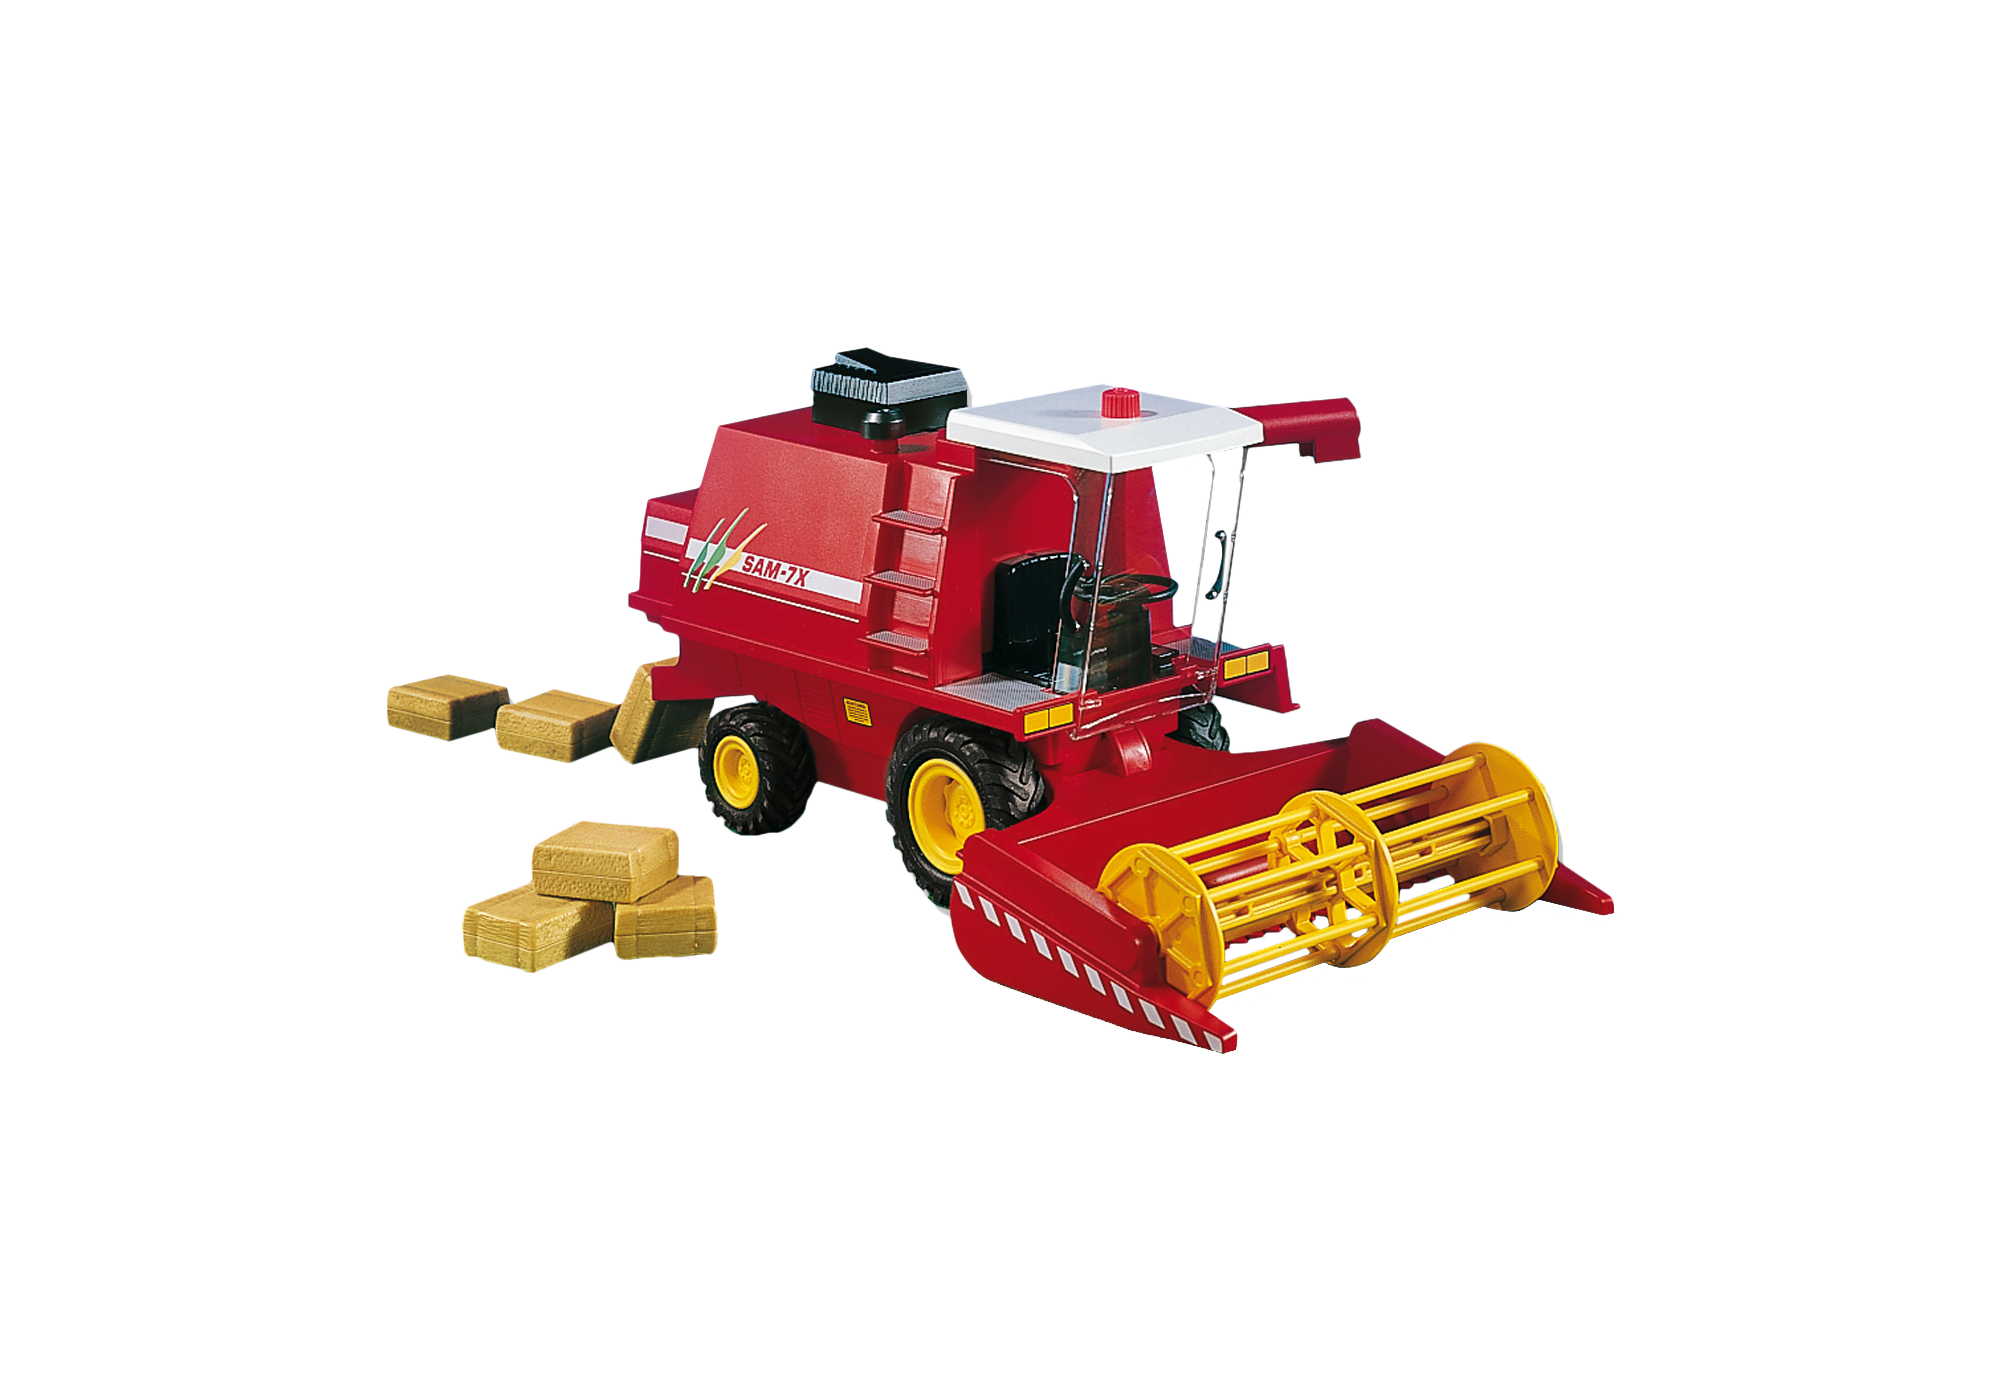 http://media.playmobil.com/i/playmobil/7645_product_detail/Harvester